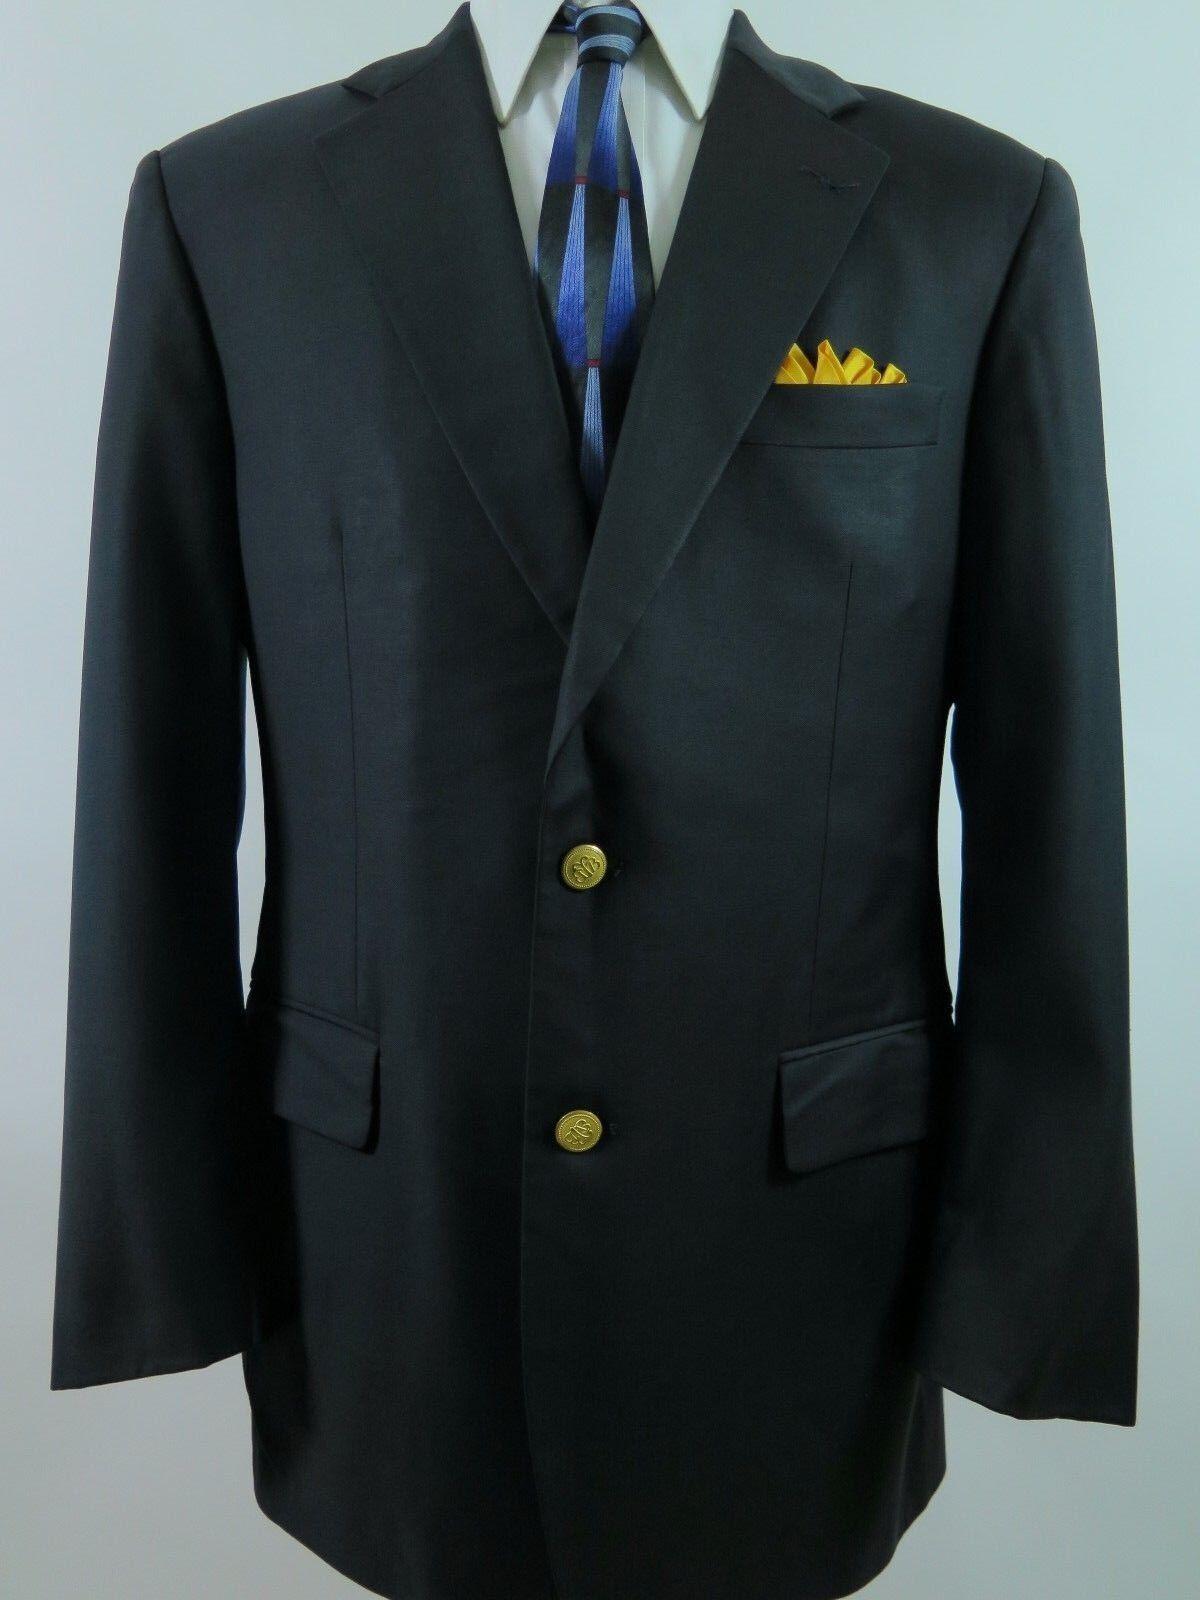 Brooks Bredhers Country Club Lgold Piana  gold Button Blazer Sport Coat 41 R